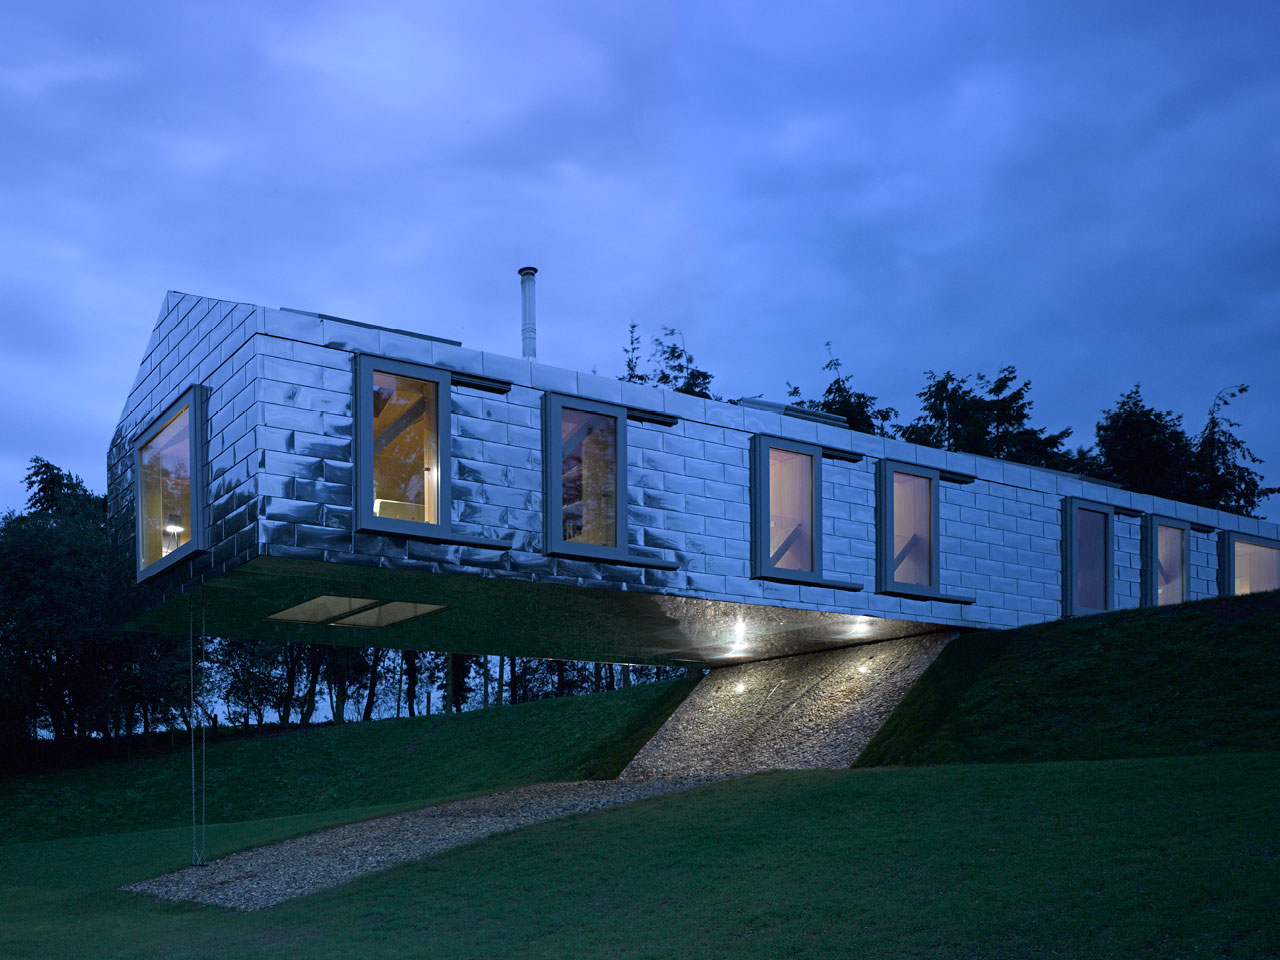 The Balancing Barn Ideasgn21 Mvrdv For Living Architecture Ideasgn